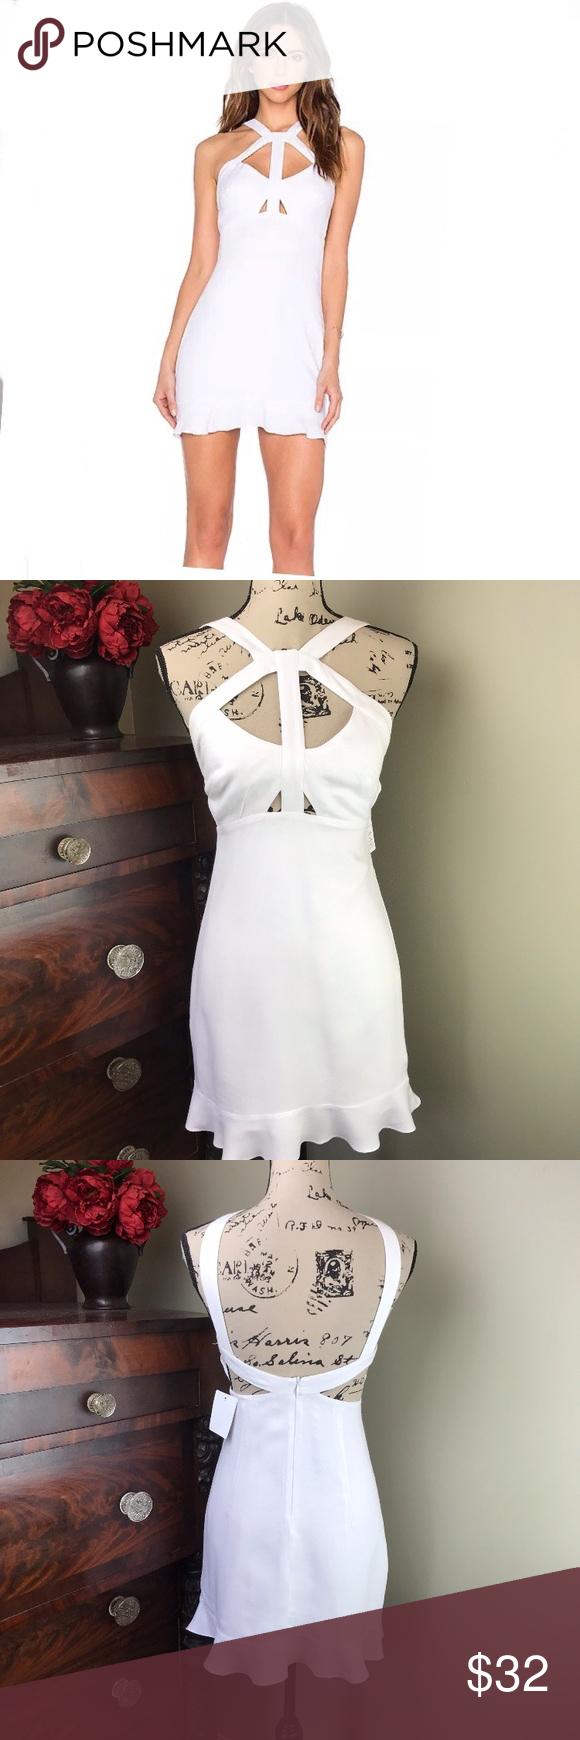 37bccc7b49b NWT Oh Boy! Vestido Recorte White Strappy Dress S NWT Oh Boy! Vestido  Recorte